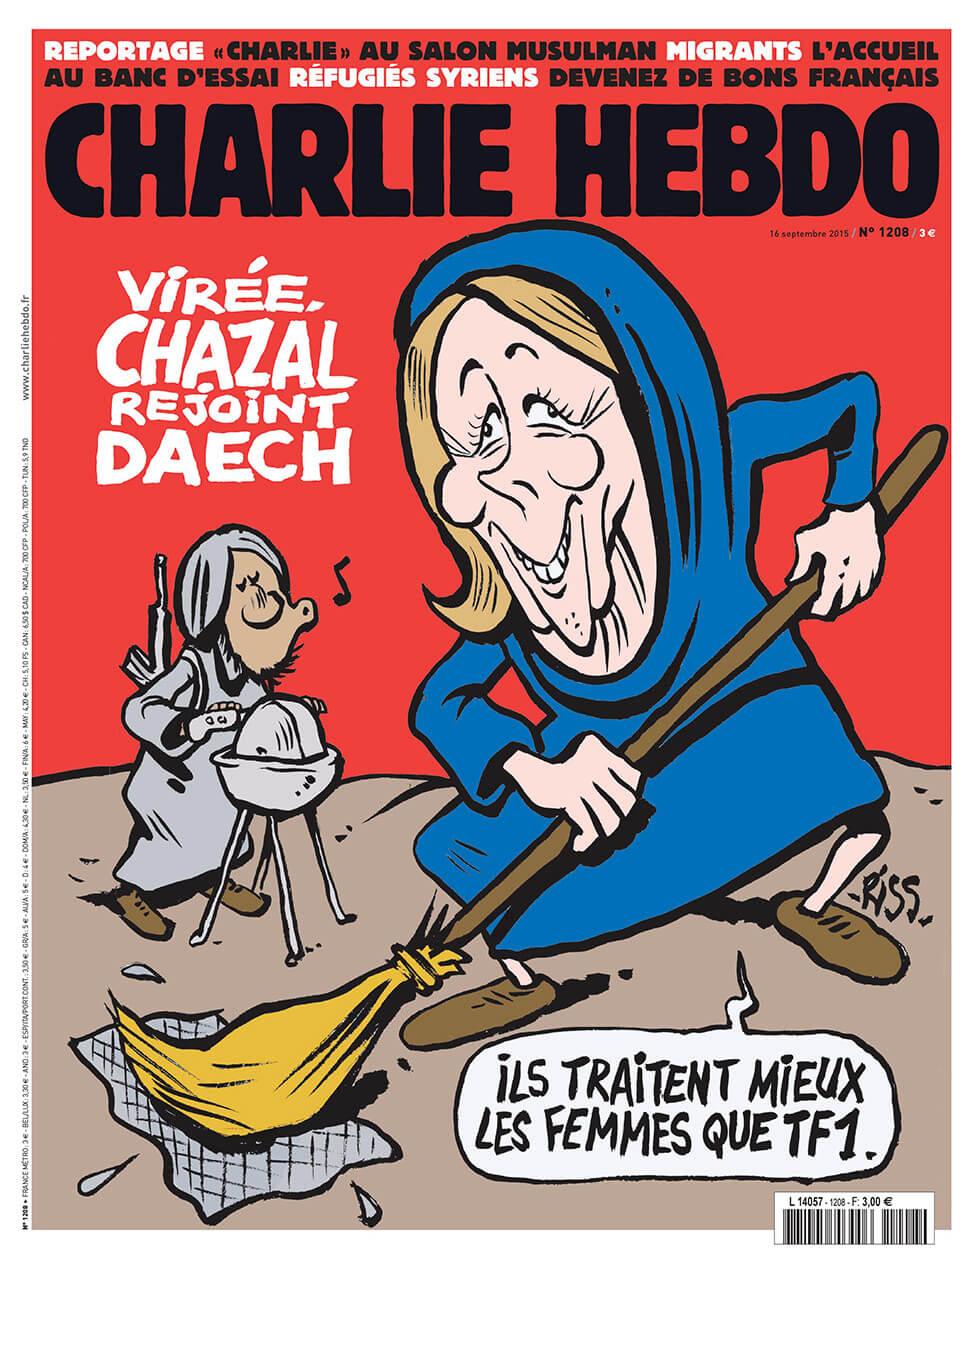 Charlie Hebdo n°1208 --- 16 septembre 2015